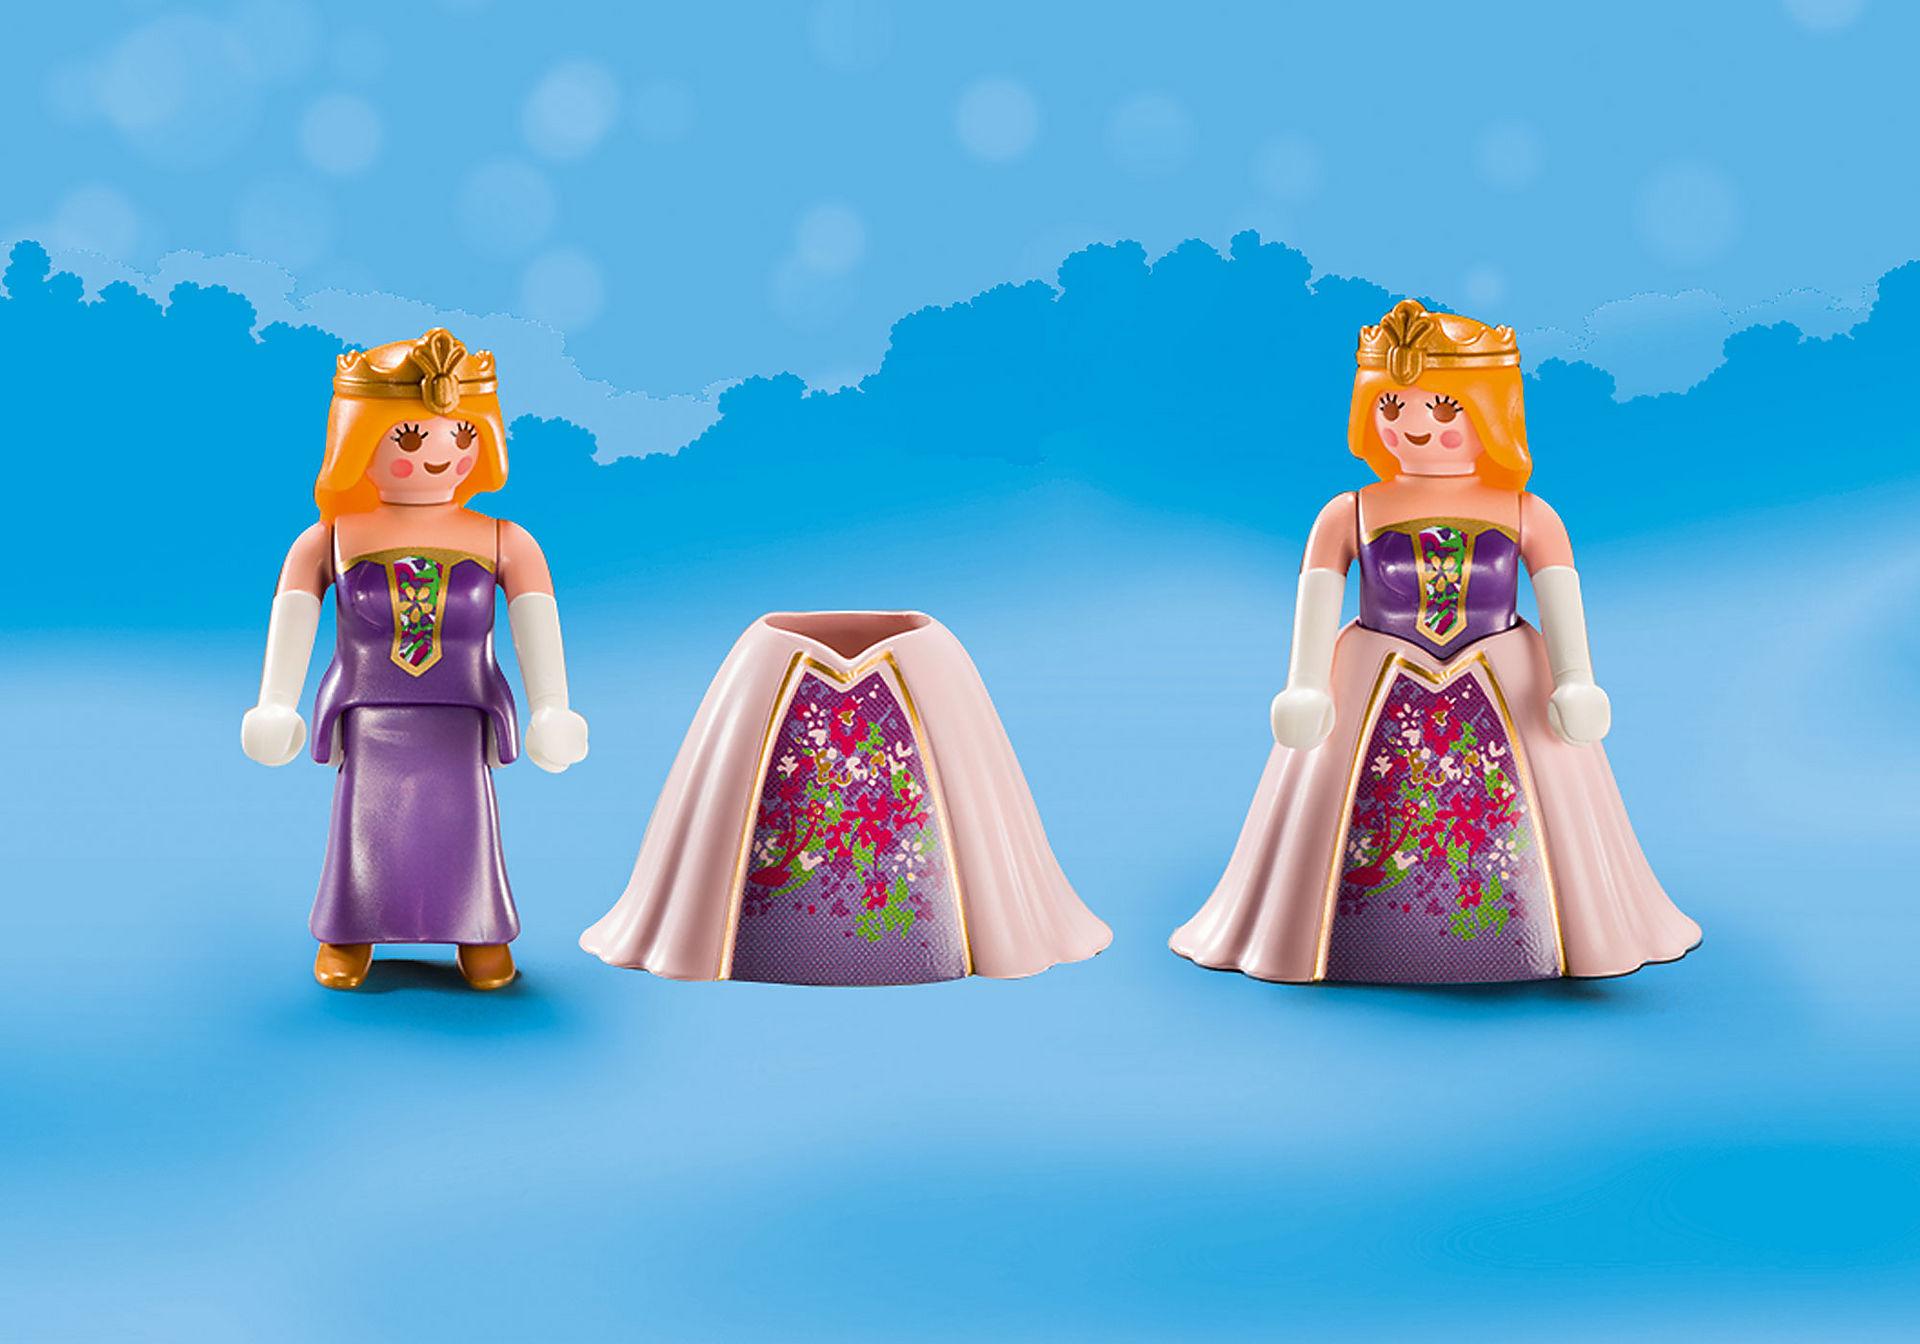 70107 Princess Unicorn Carry Case L zoom image4